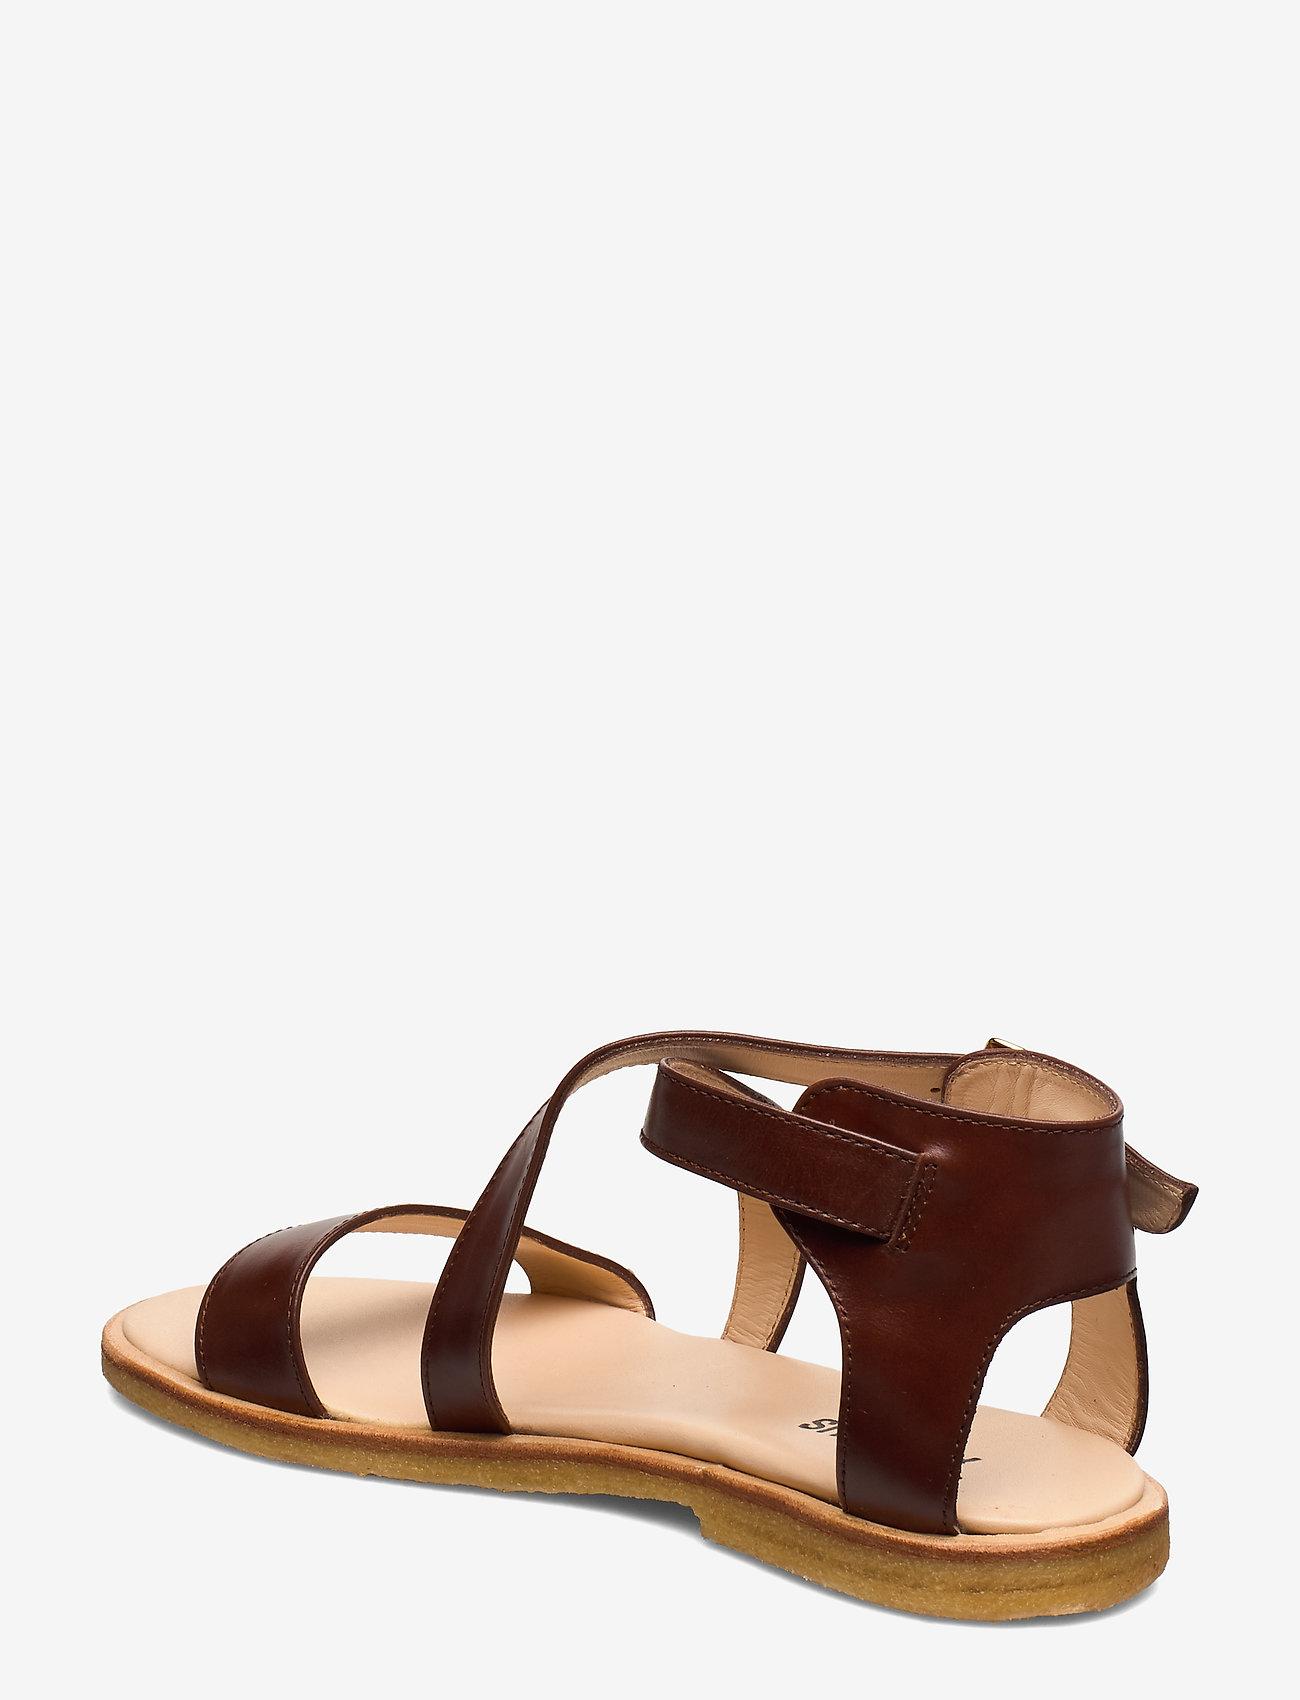 ANGULUS - 5442 - matalat sandaalit - 1837 brown - 1